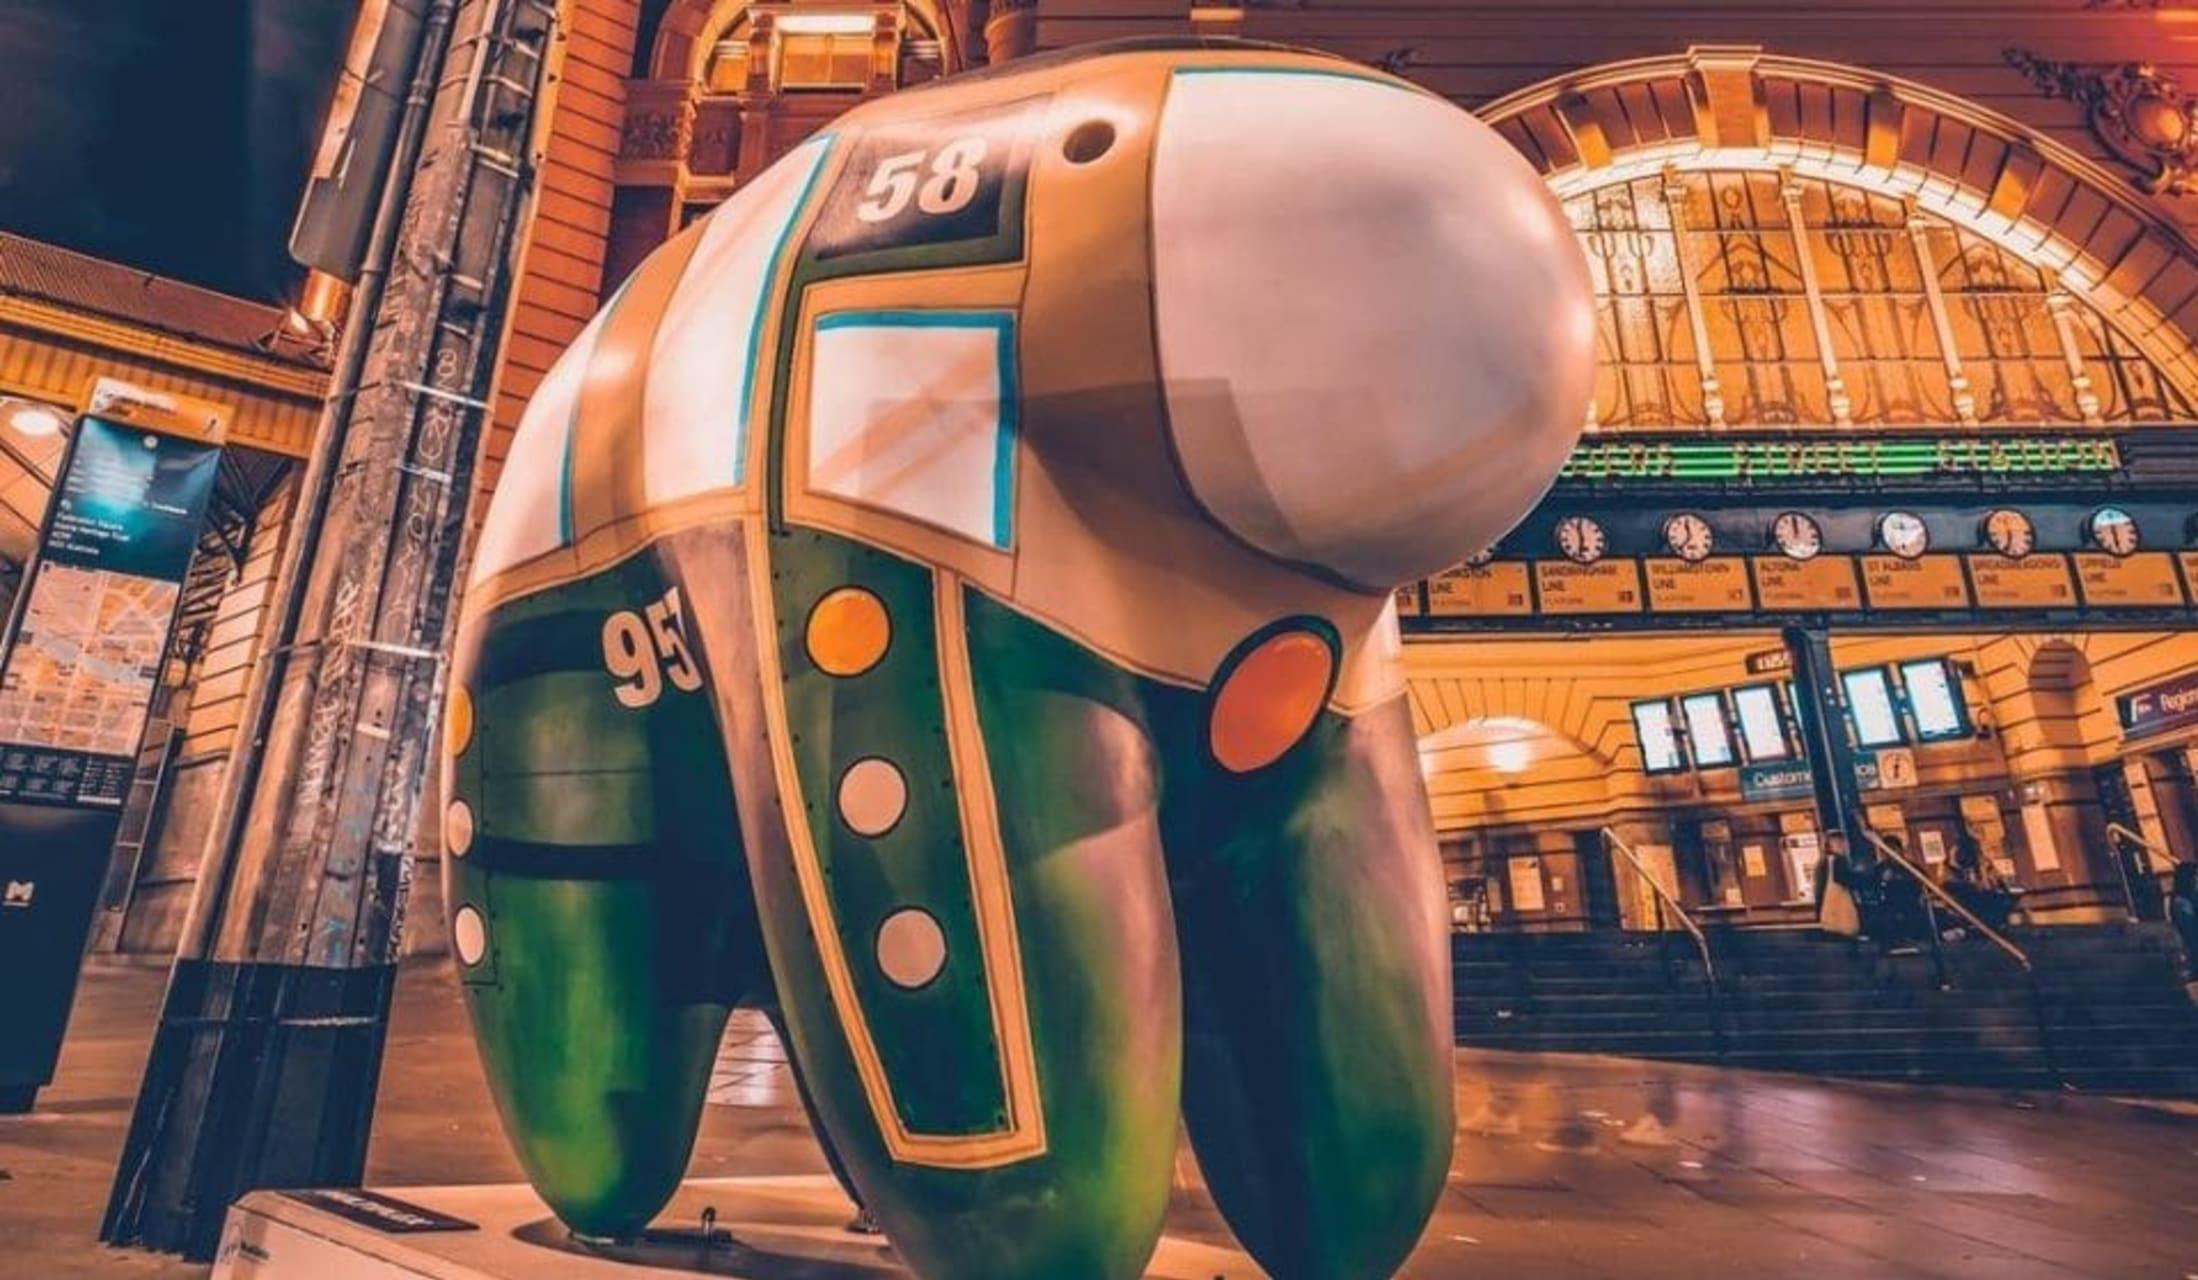 Melbourne - Art Special: Melbourne's Colourful UooUoo Trail - Part 5